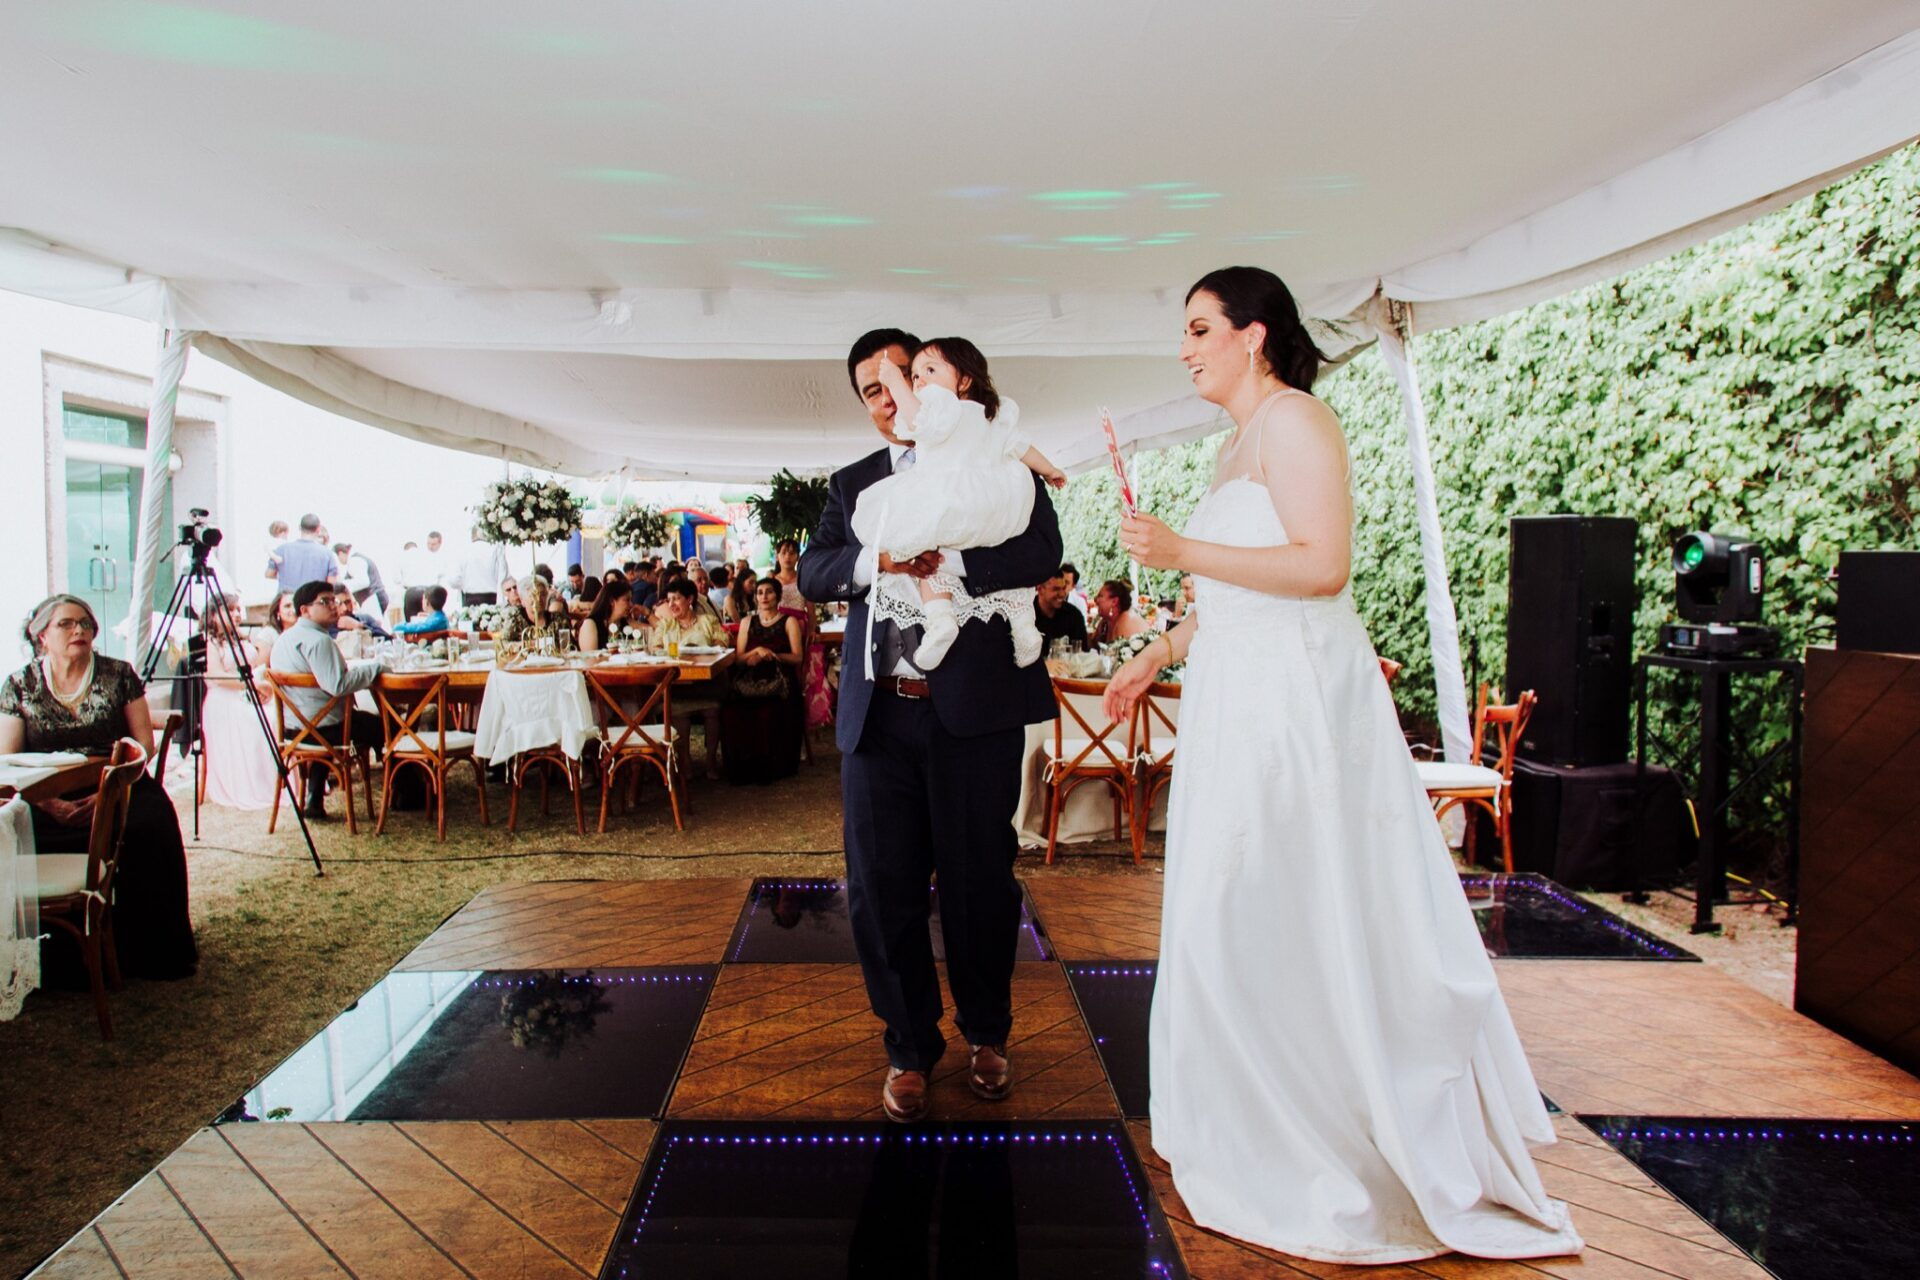 javier_noriega_fotografo_bodas_centro_platero_zacatecas_wedding_photographer36